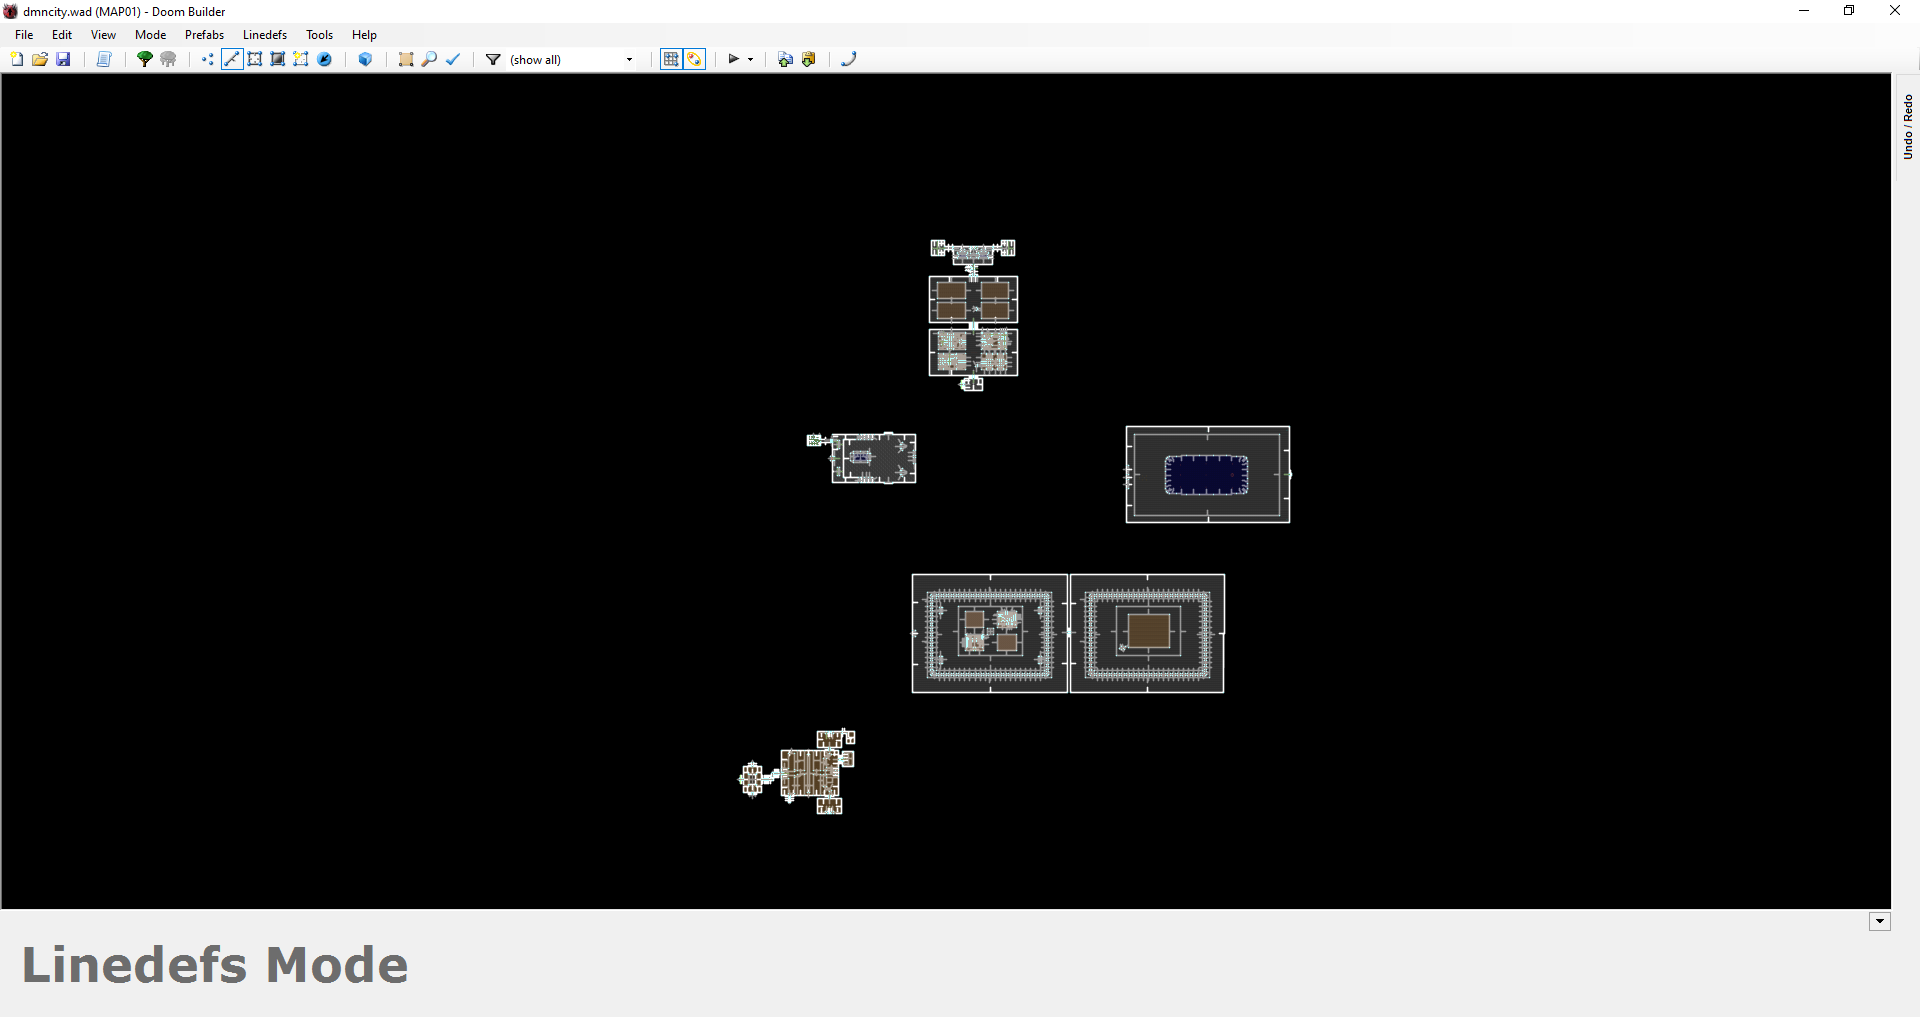 dmncity.wad (MAP01) - Doom Builder 5_31_2020 12_11_52 AM.png